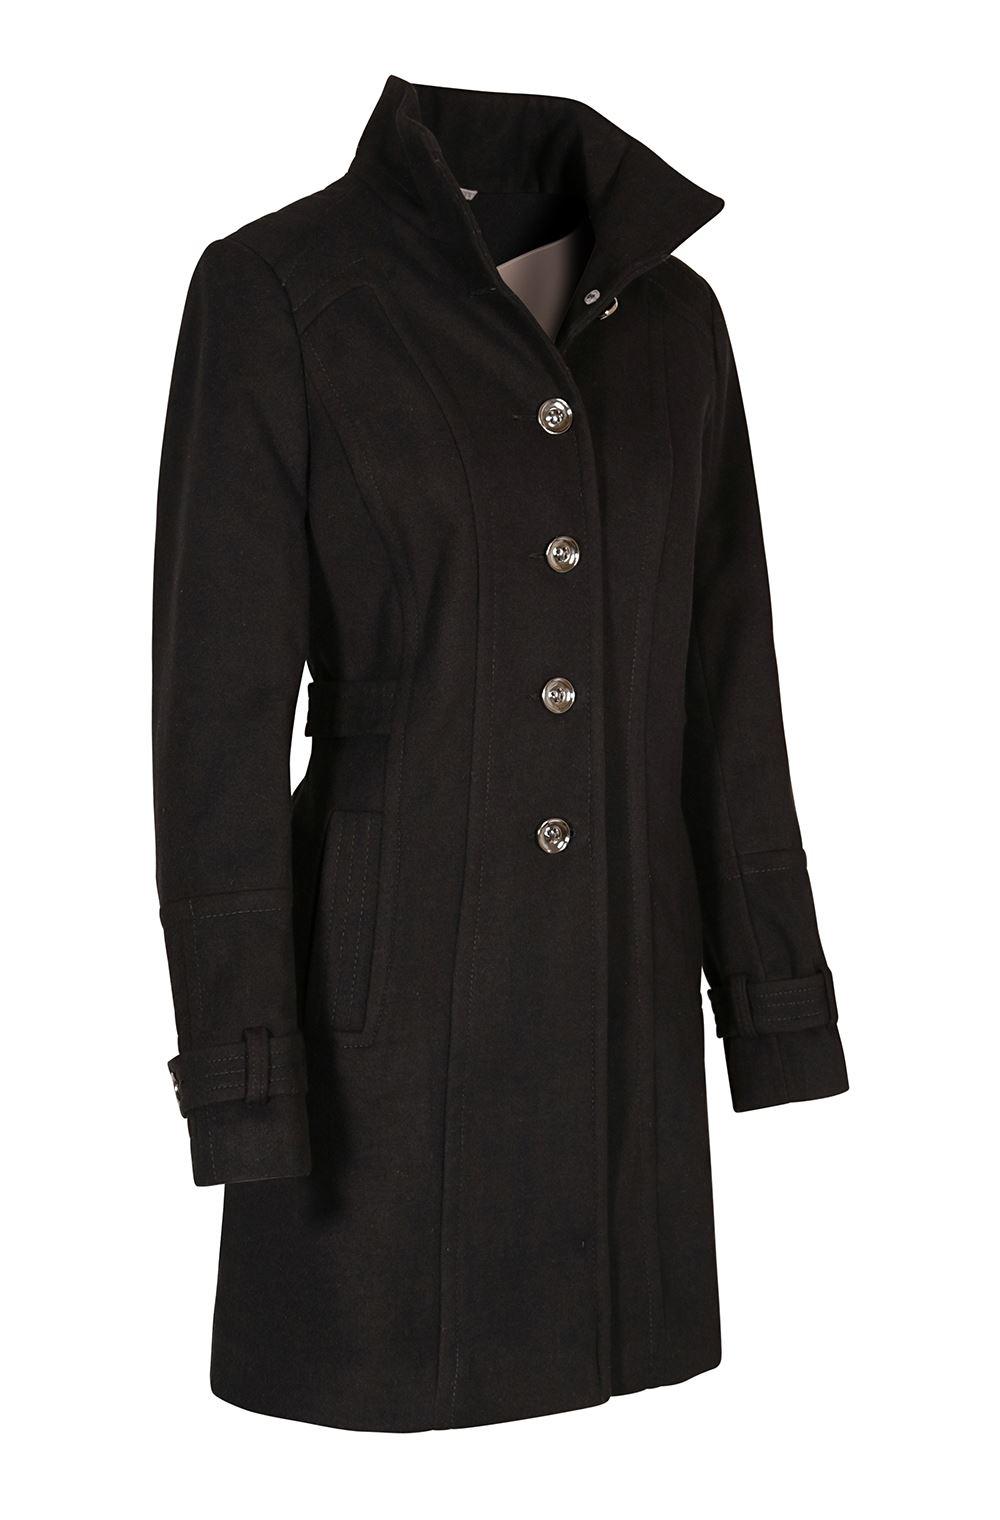 Ex Wallis Funnel Neck Button Down Winter Coat in Beige or Black Size 8-16